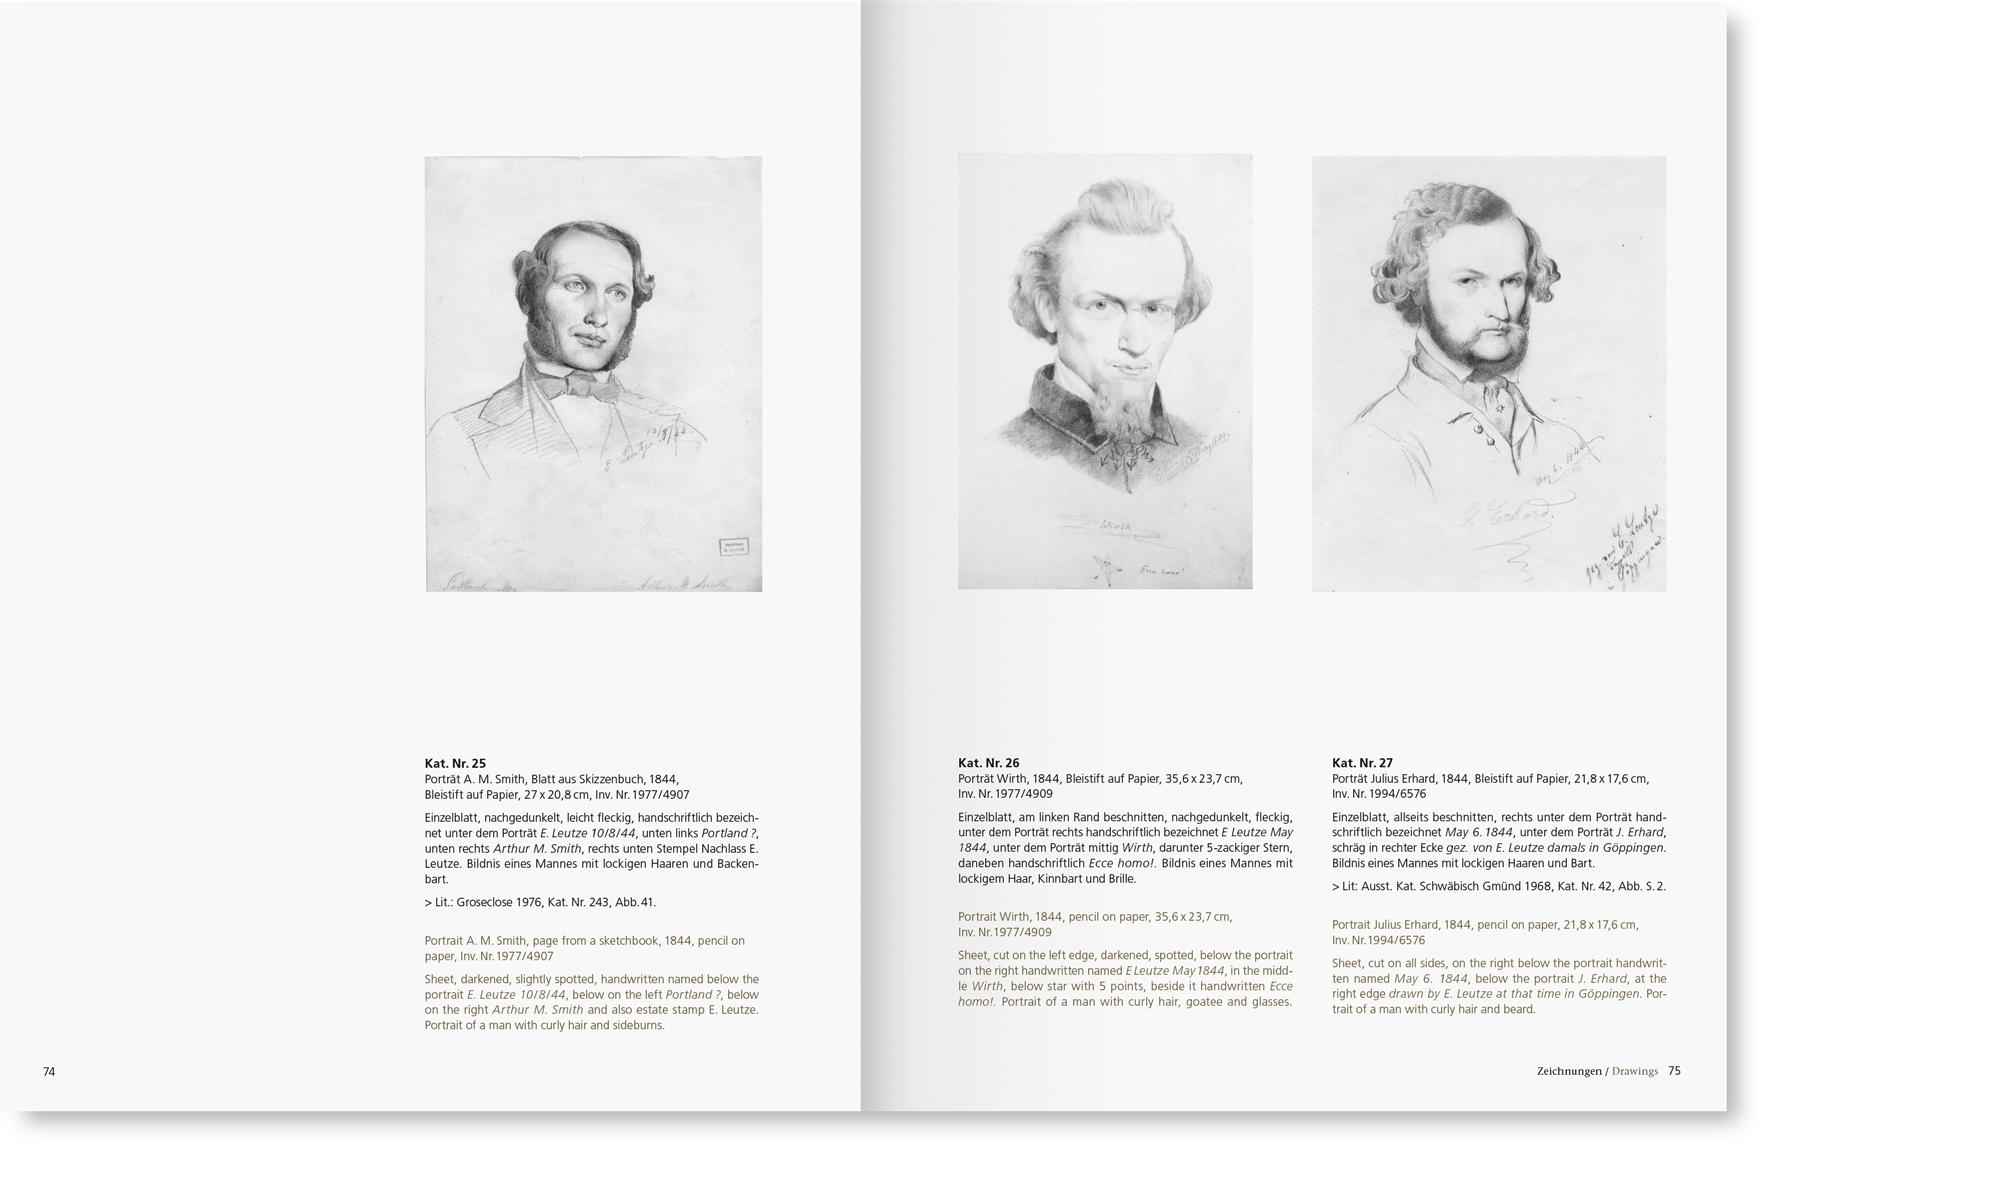 fh-web-leutze-katalog-S74-75.jpg